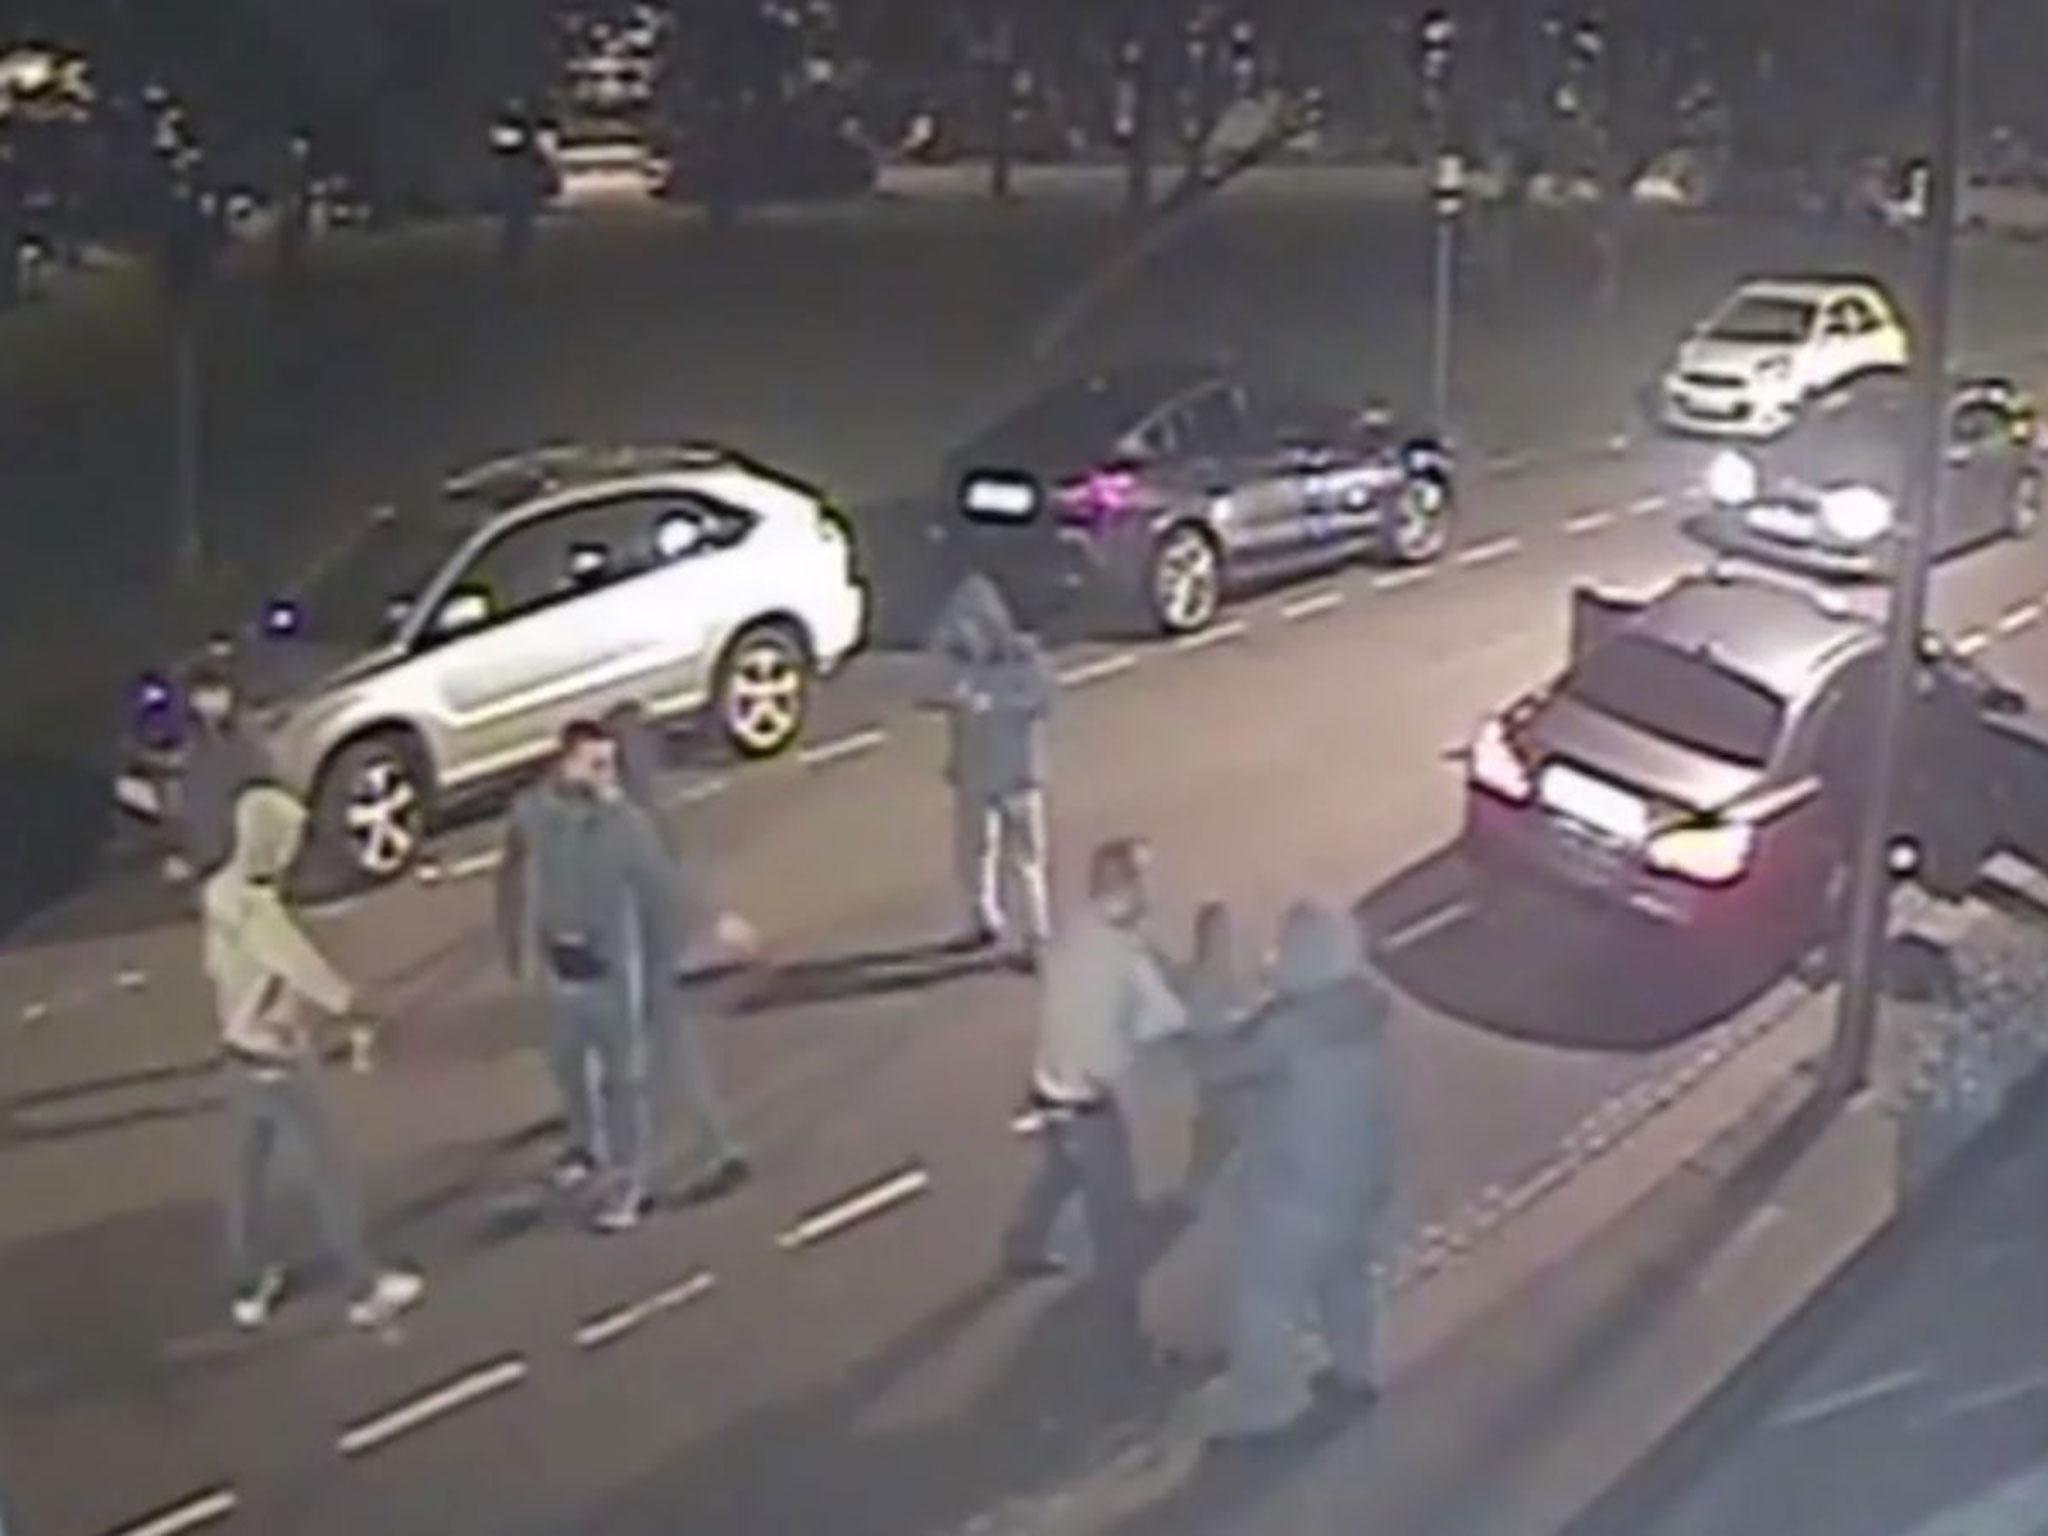 CCTV captures shooting during 12-man brawl in north London